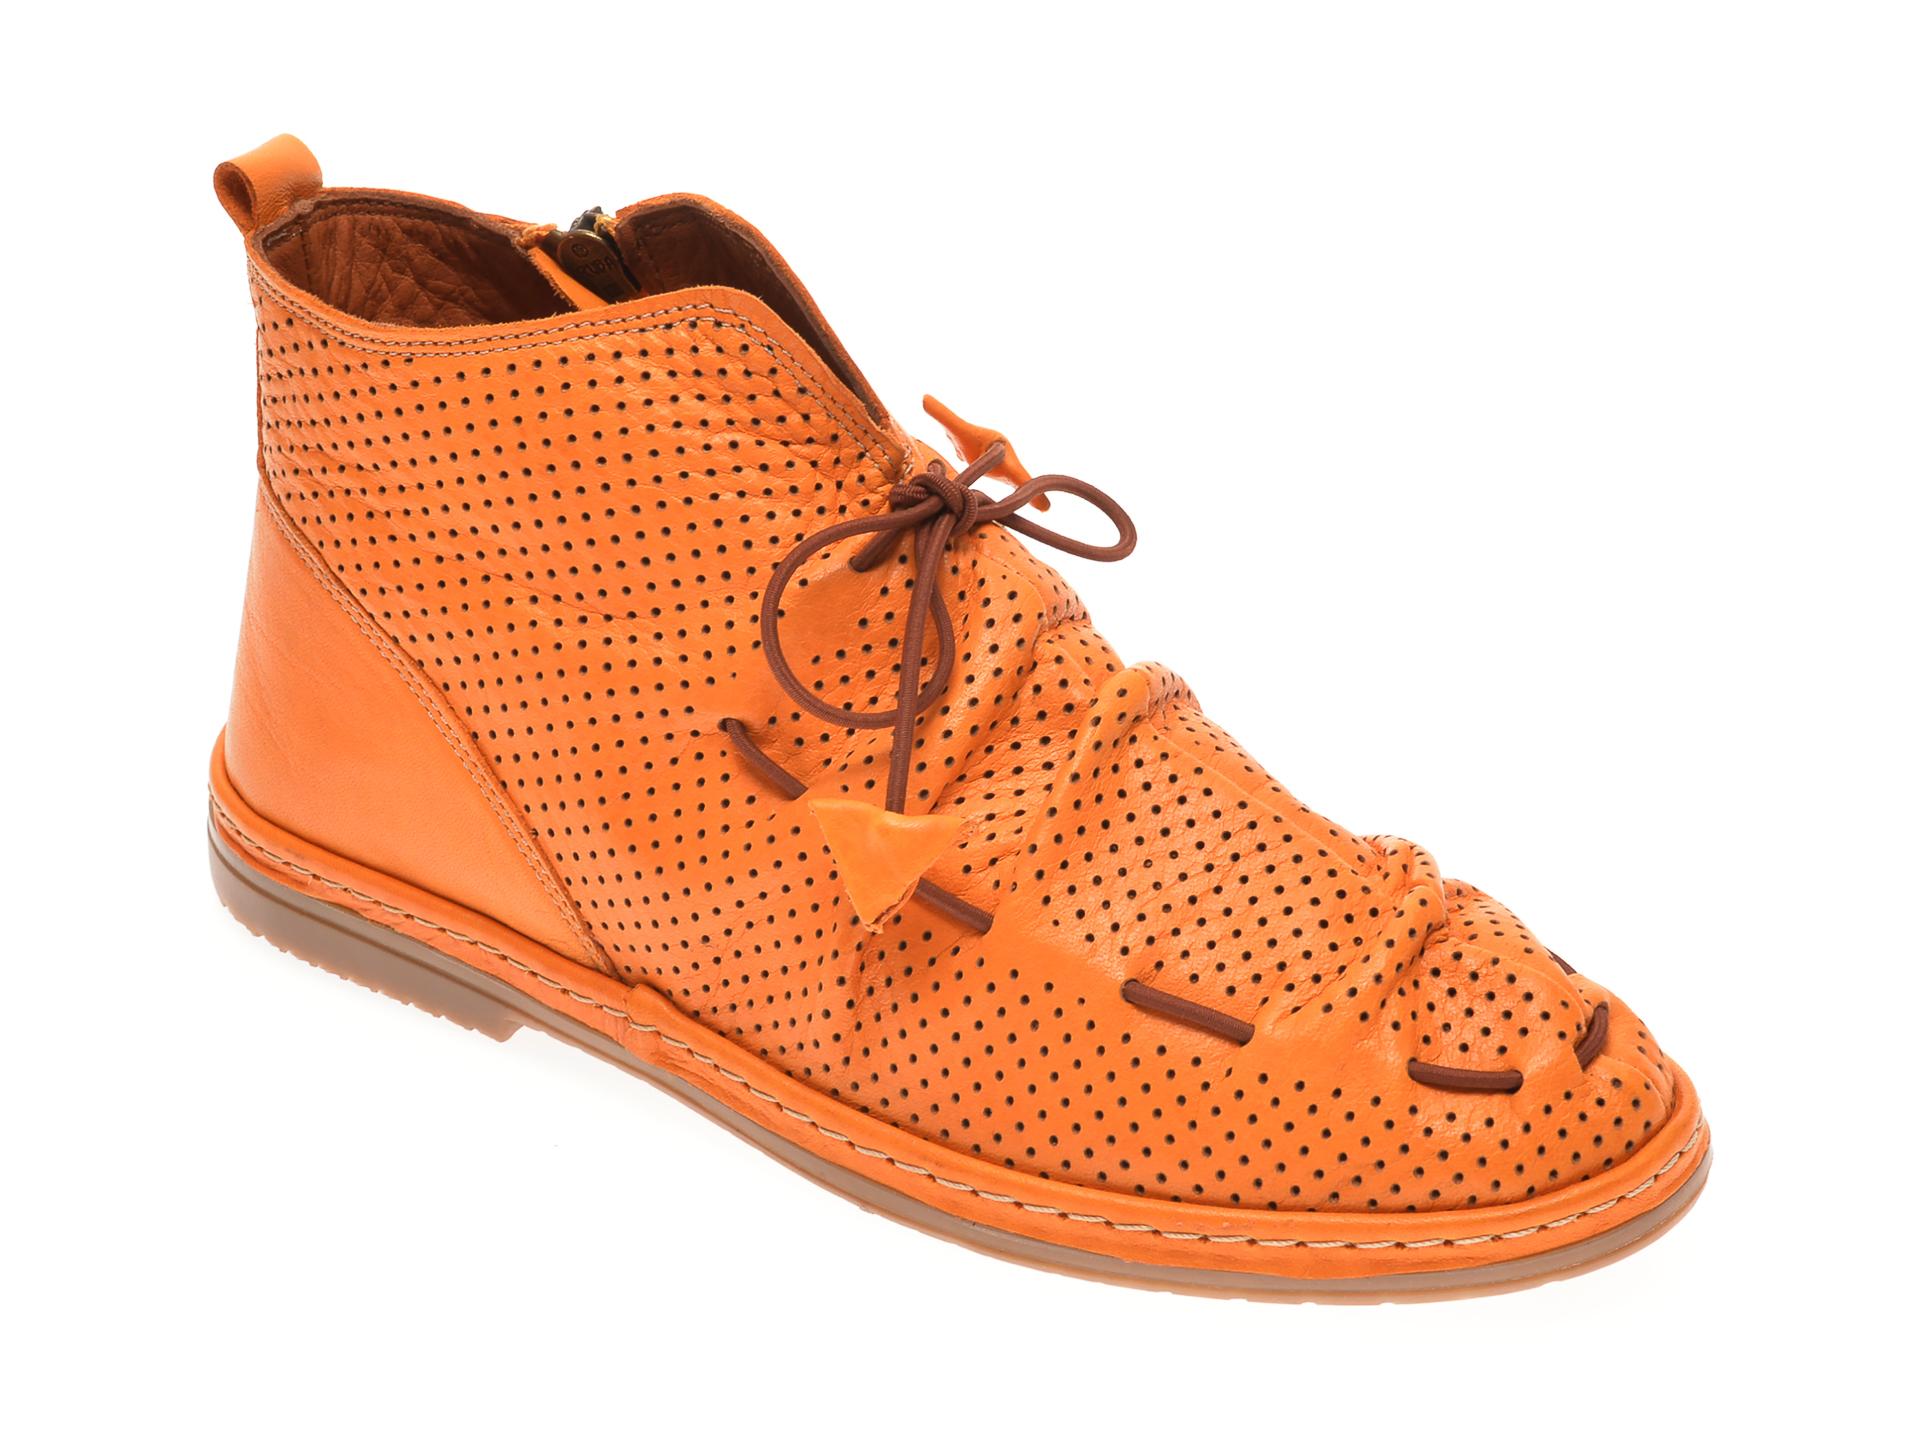 Ghete BABOOS portocalii, 1151704, din piele naturala imagine